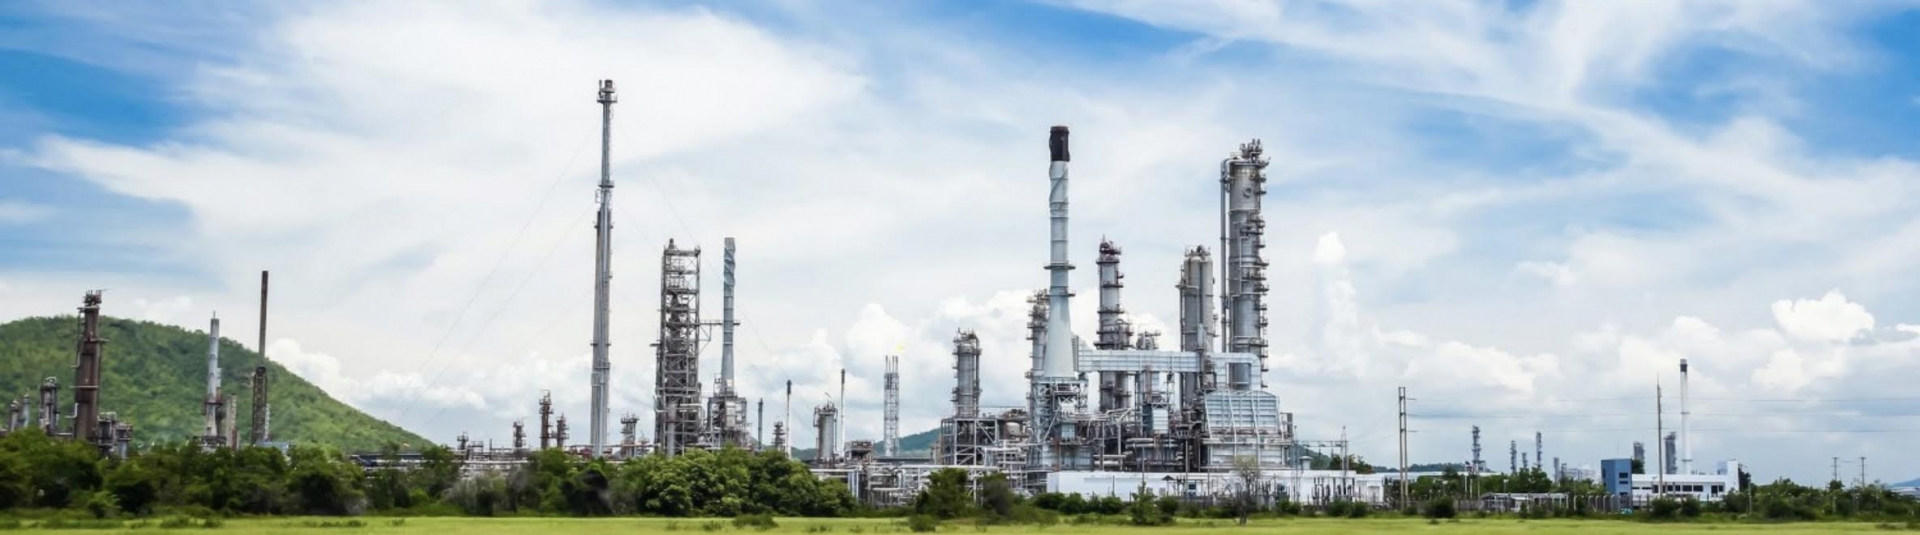 NexantECA Renewable Chemicals and Energy